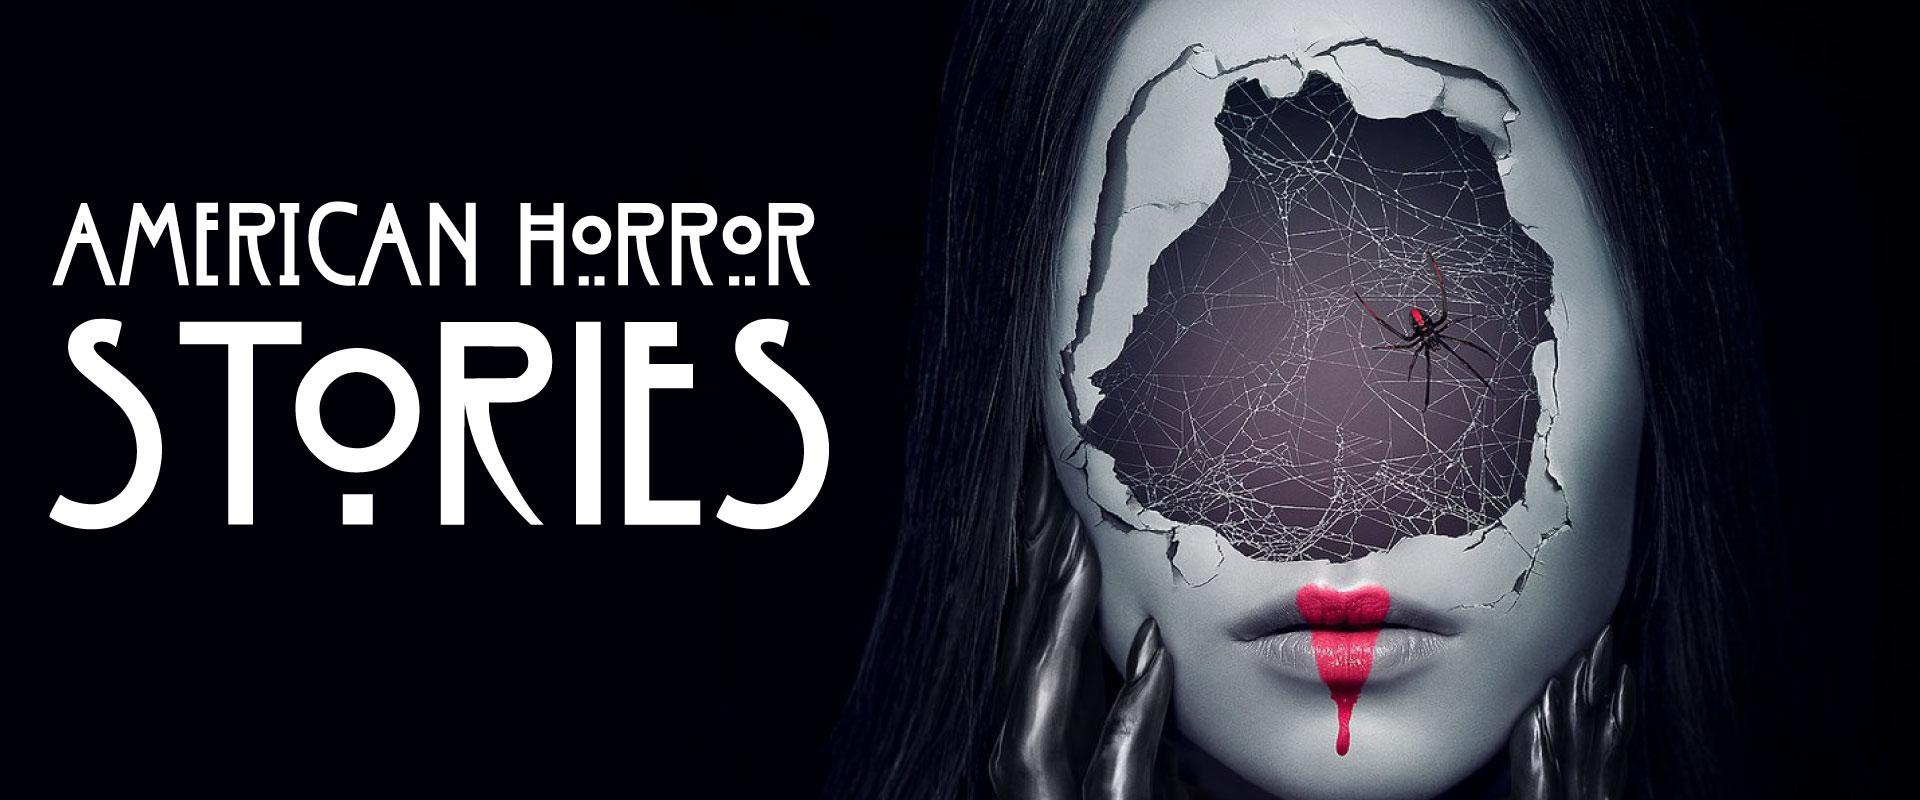 American Horror Stories in arrivo su Disney+: tra leggende horror e film dannati